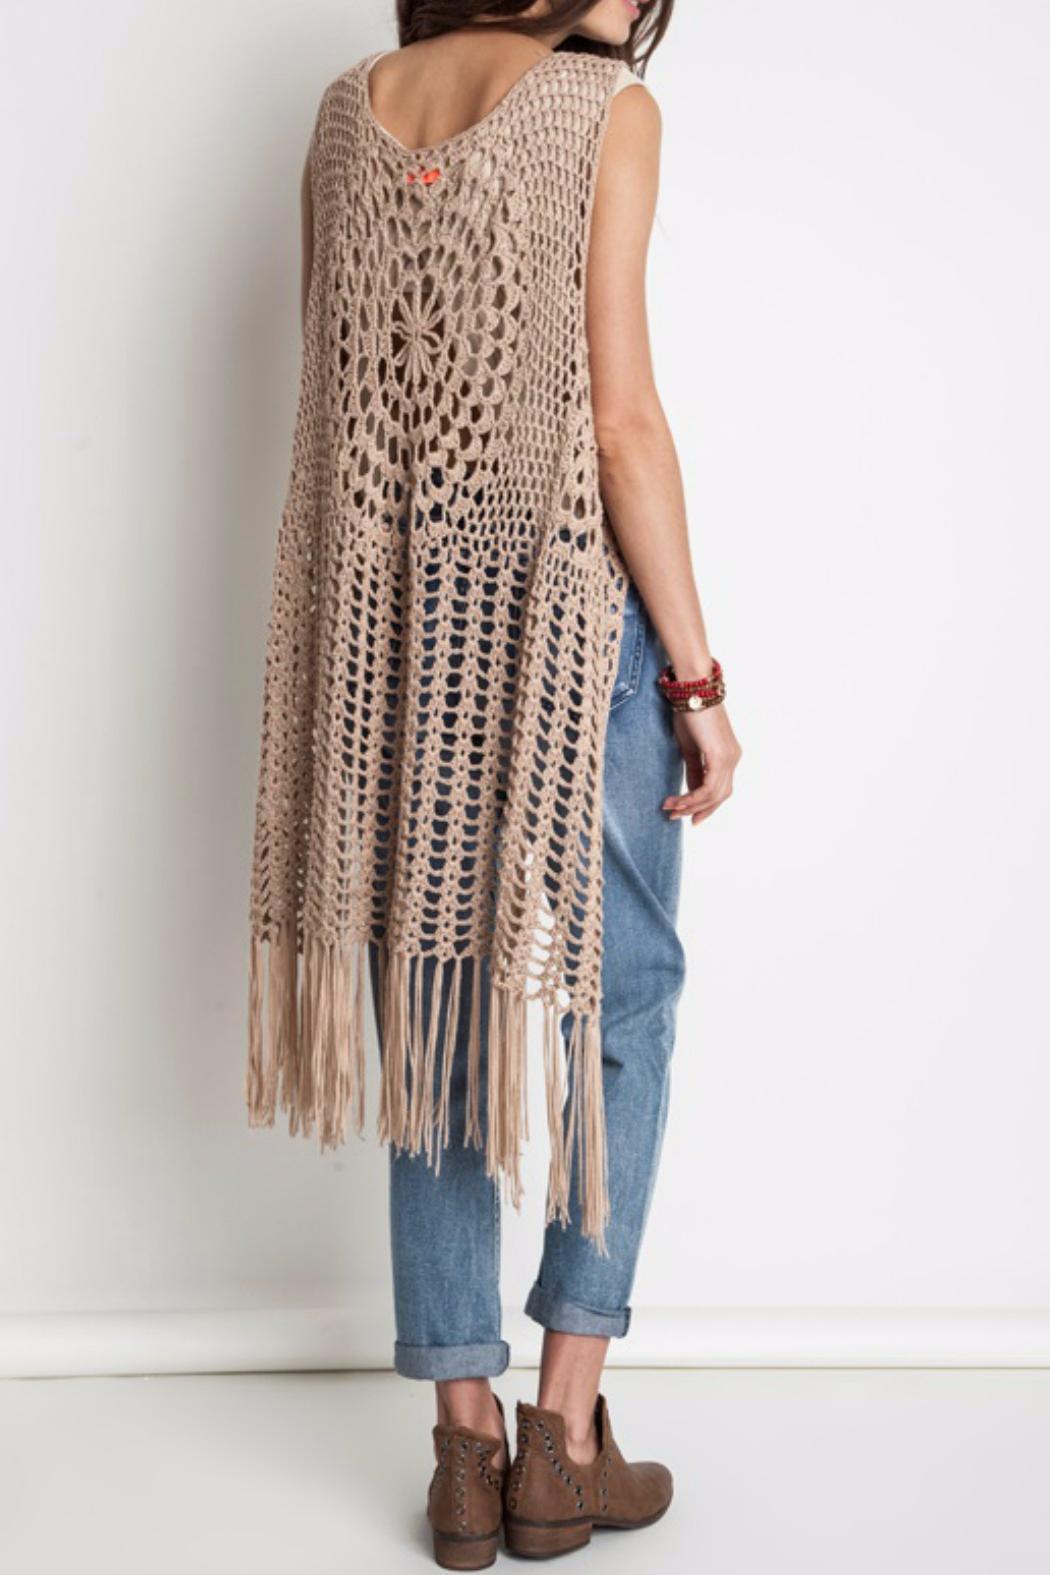 Crochet Vest ... harlow crochet vest by umgee (taupe) - thumbnail 3 unwepxv